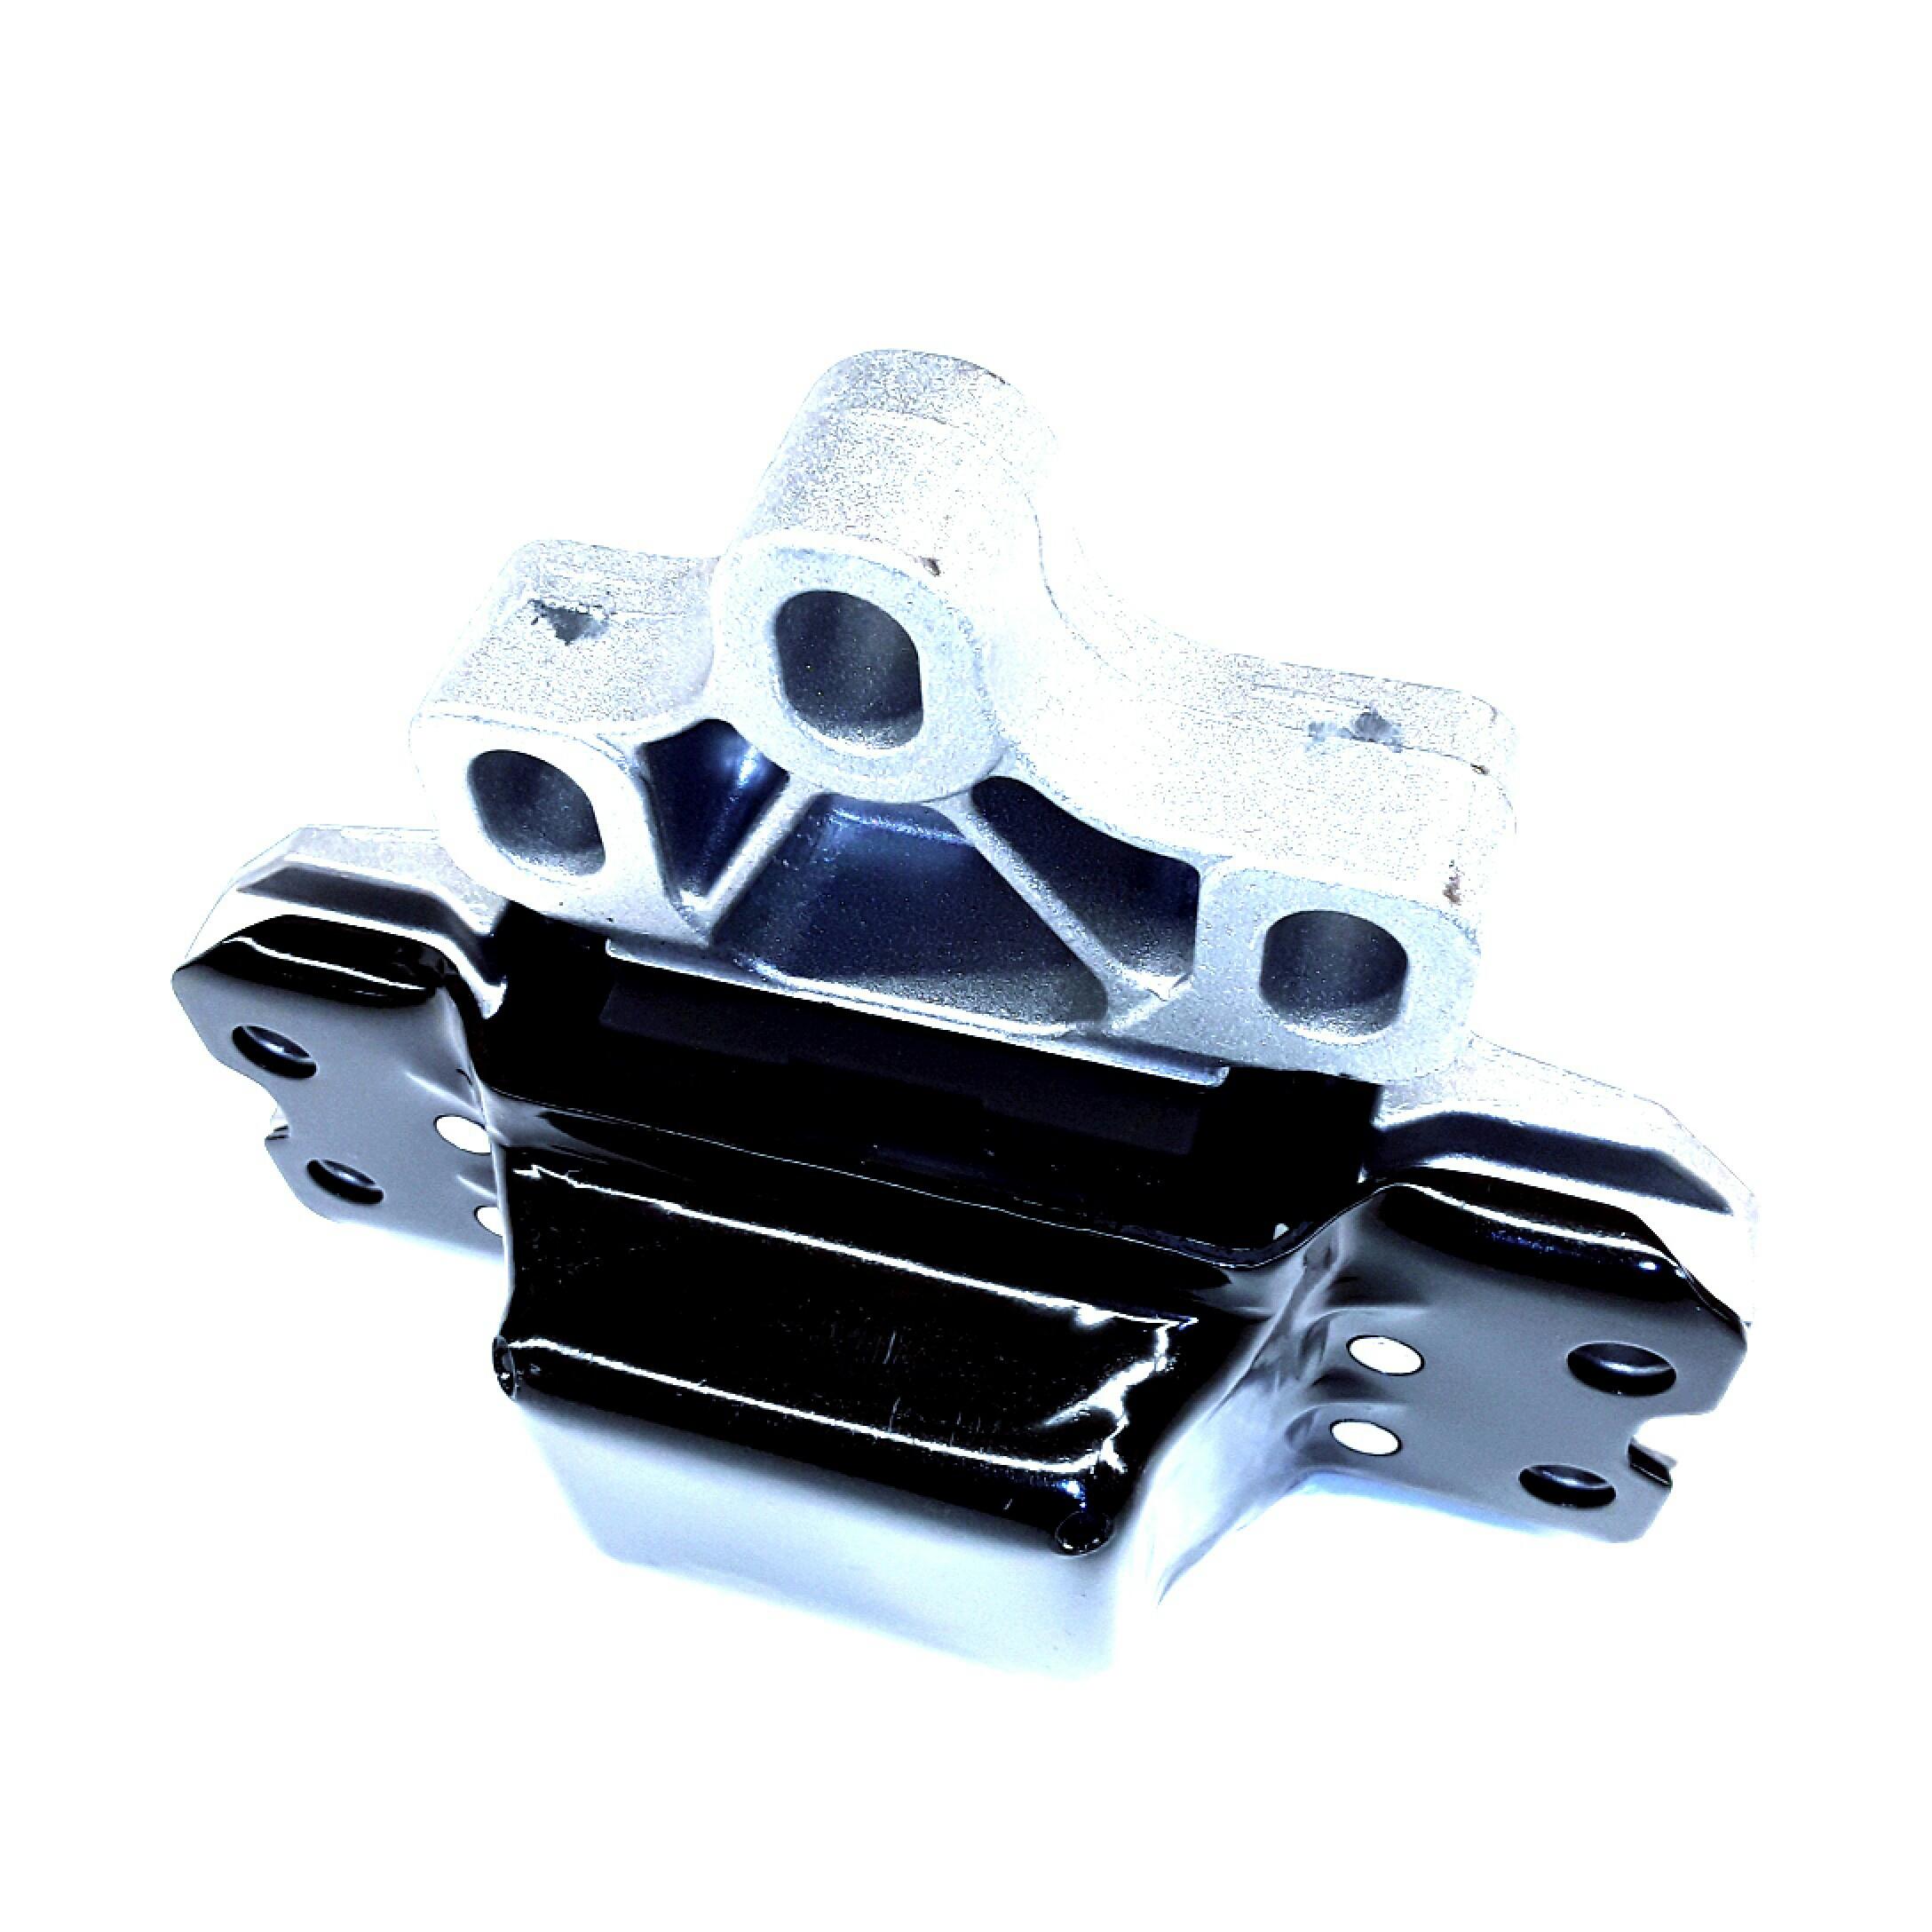 1k0199555ab 2010 Volkswagen Gearbox Mounting Engine